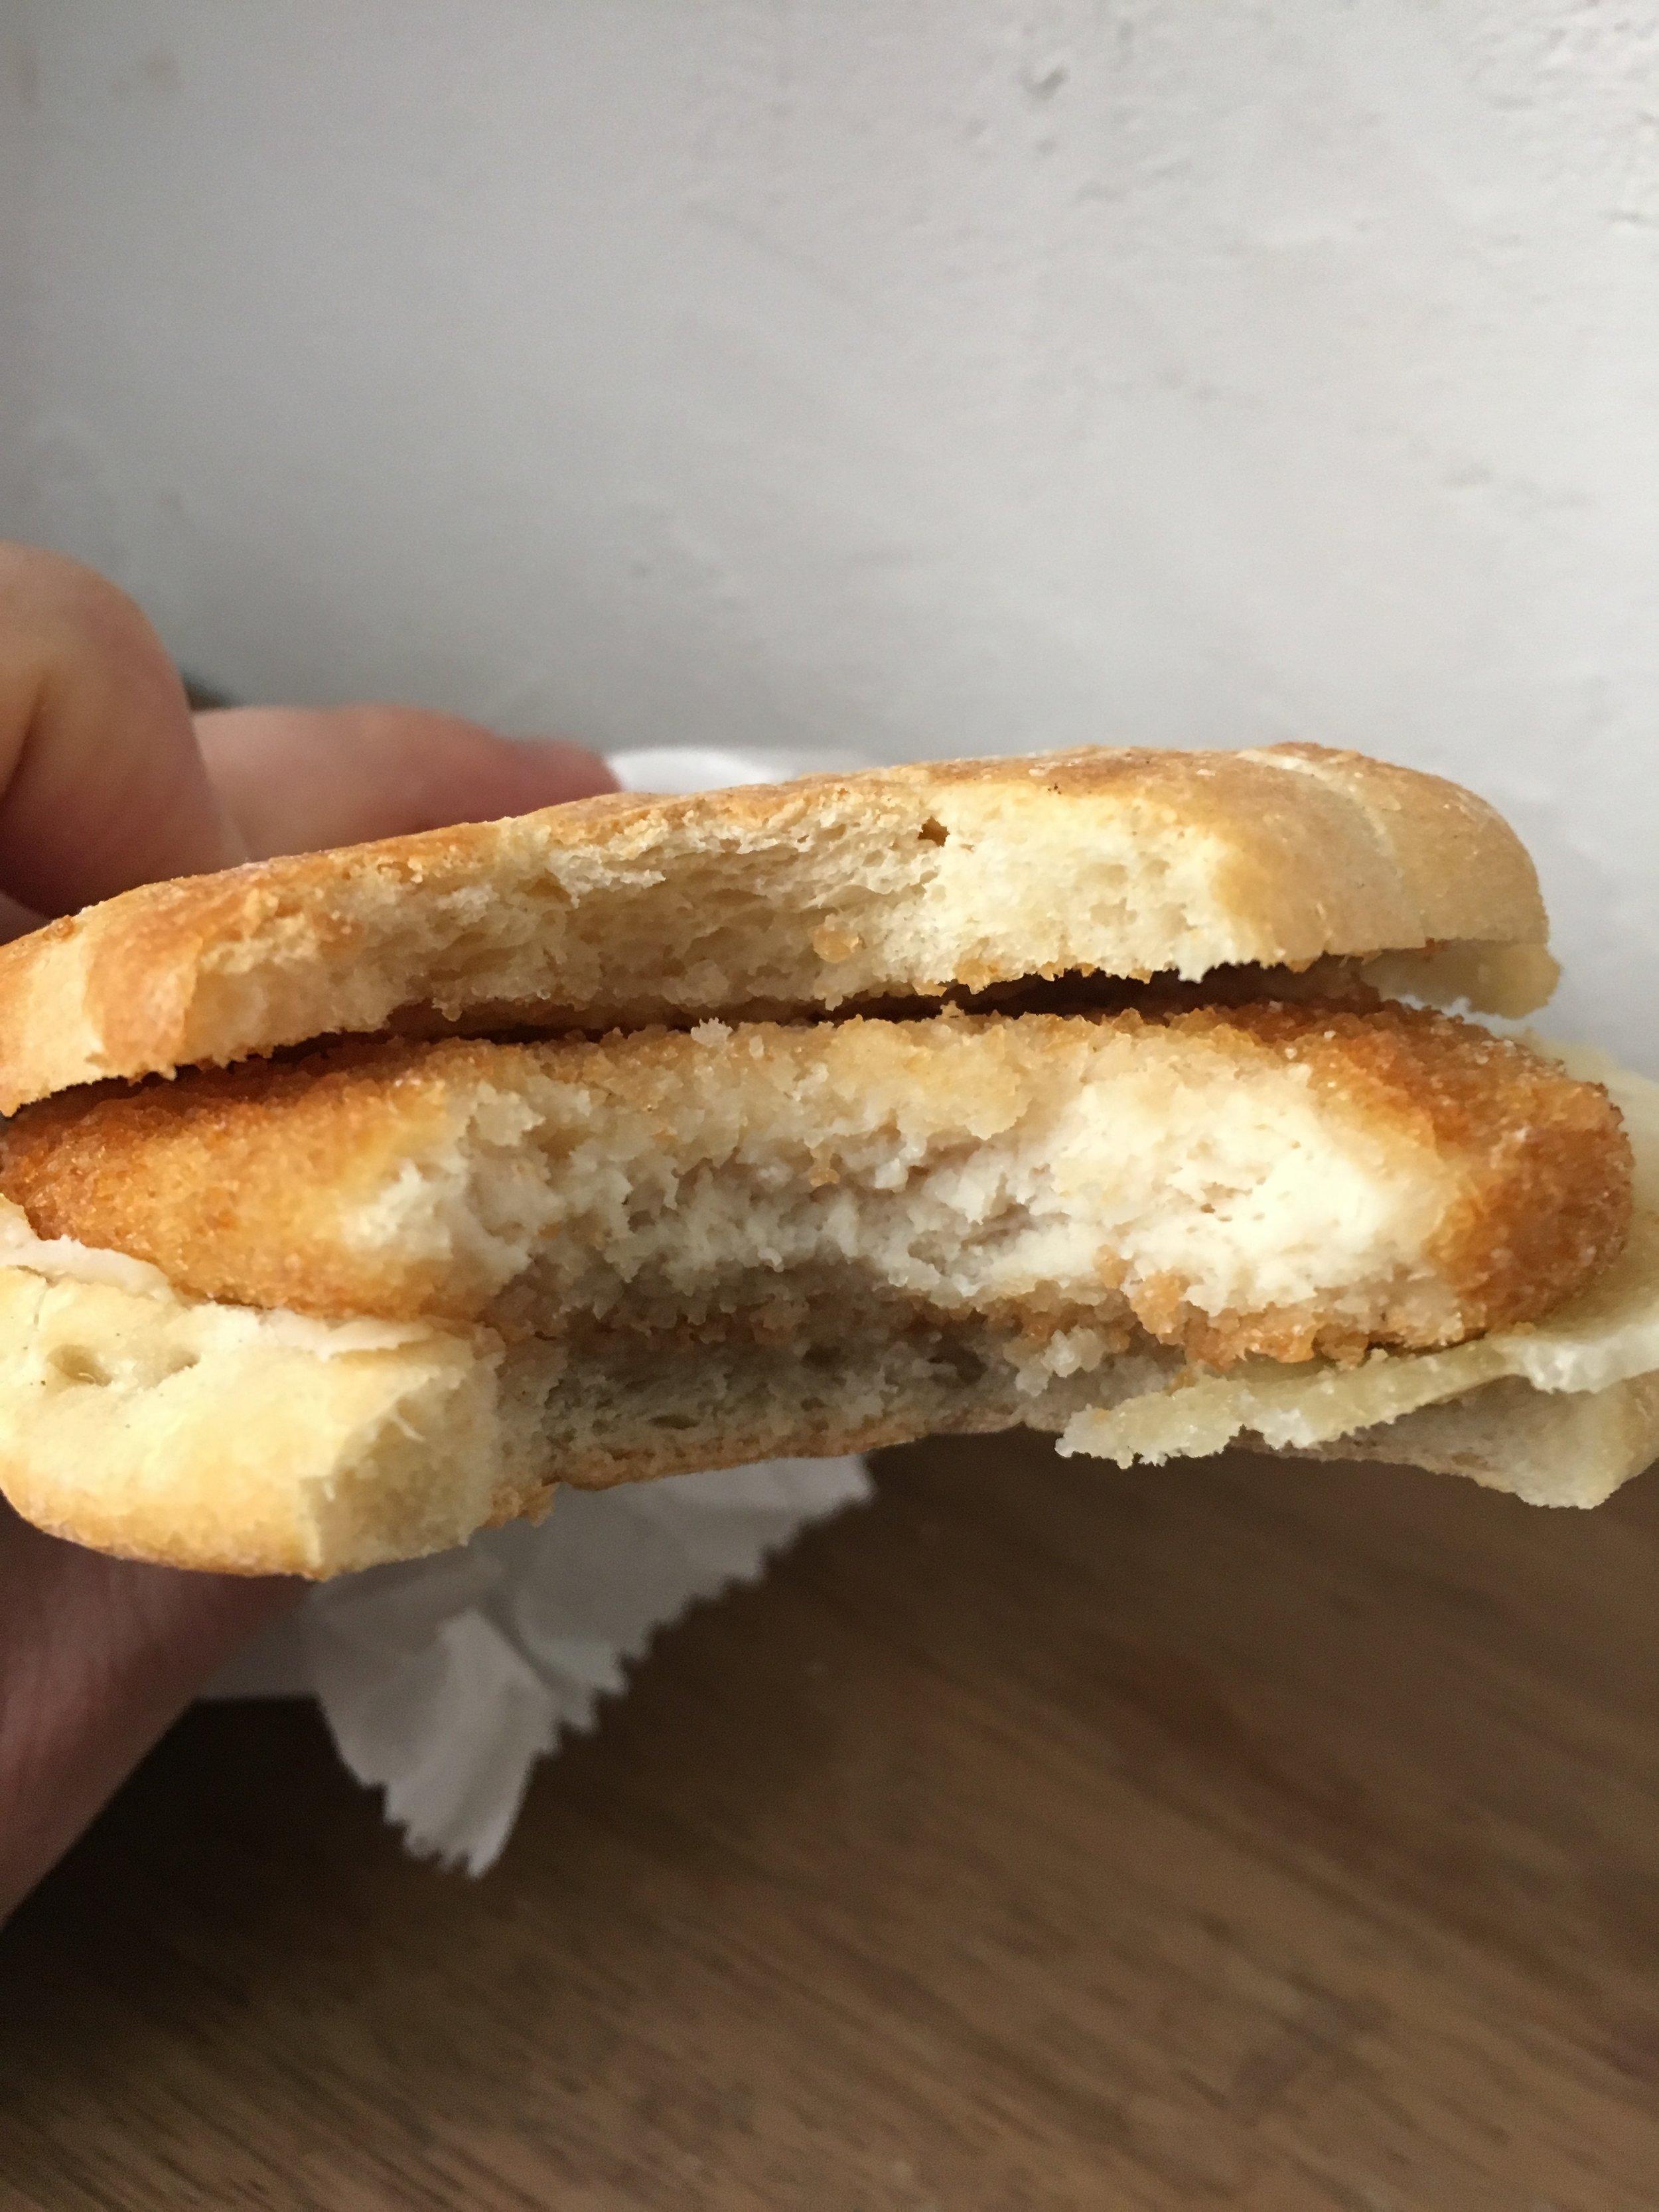 chicken_sandwich_tuscany